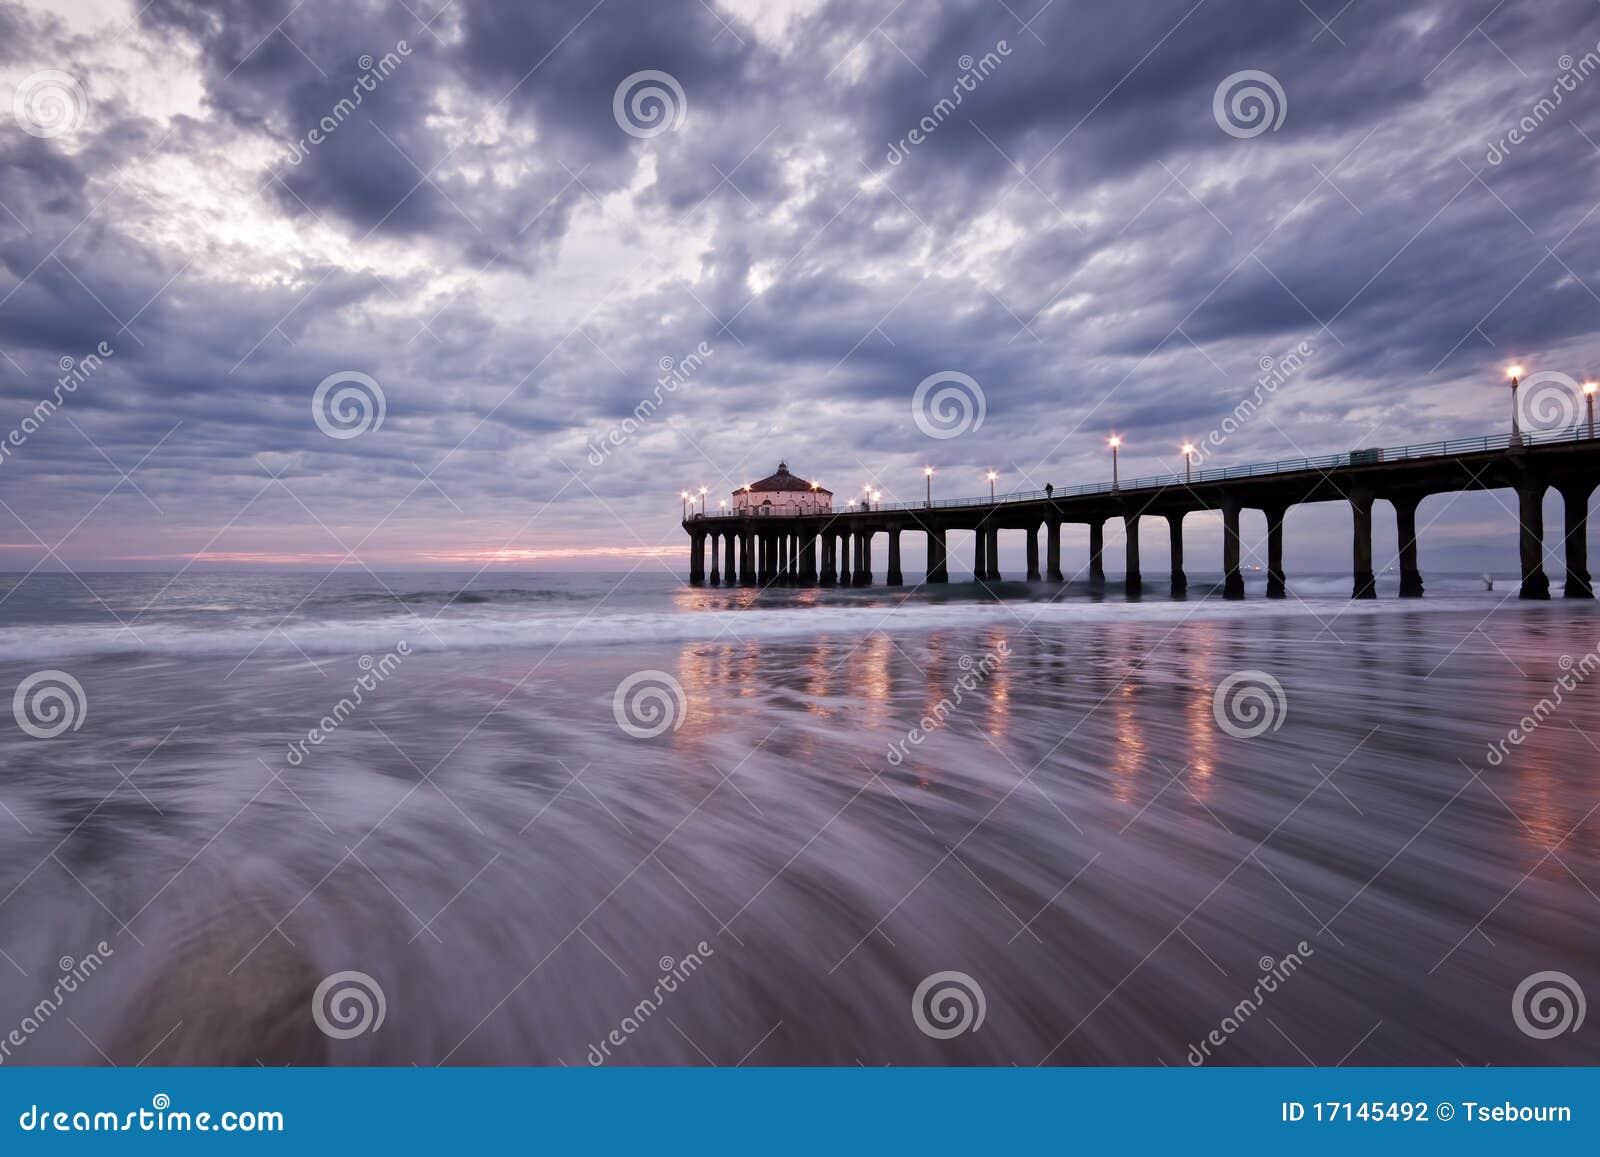 Manhattan Beach Pier Dreamy Sunset Stock Photo Image Of Stormy